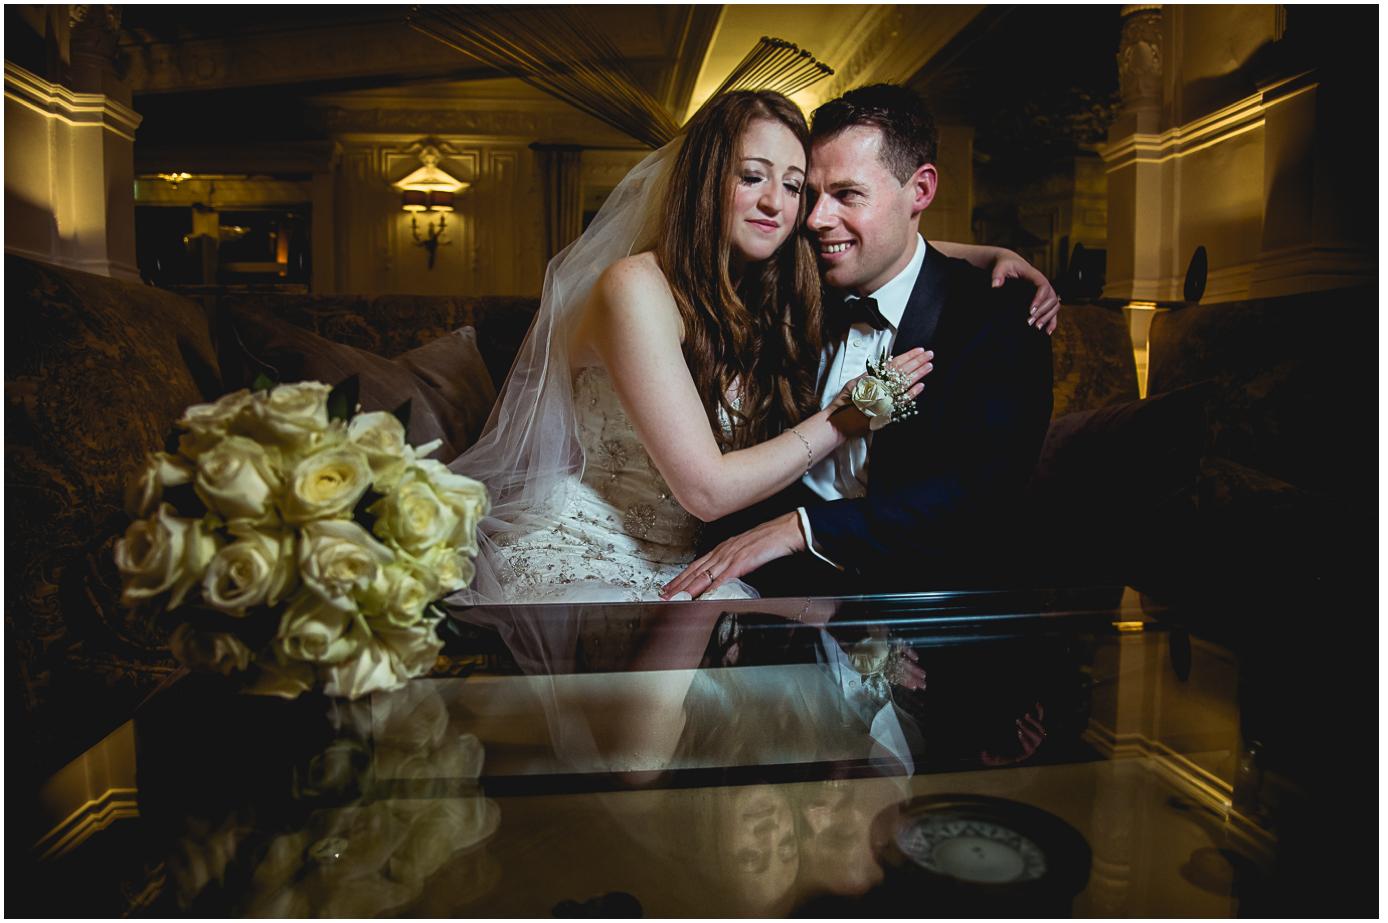 50 - Esmat and Angus - St. Ermin's Hotel London wedding photographer